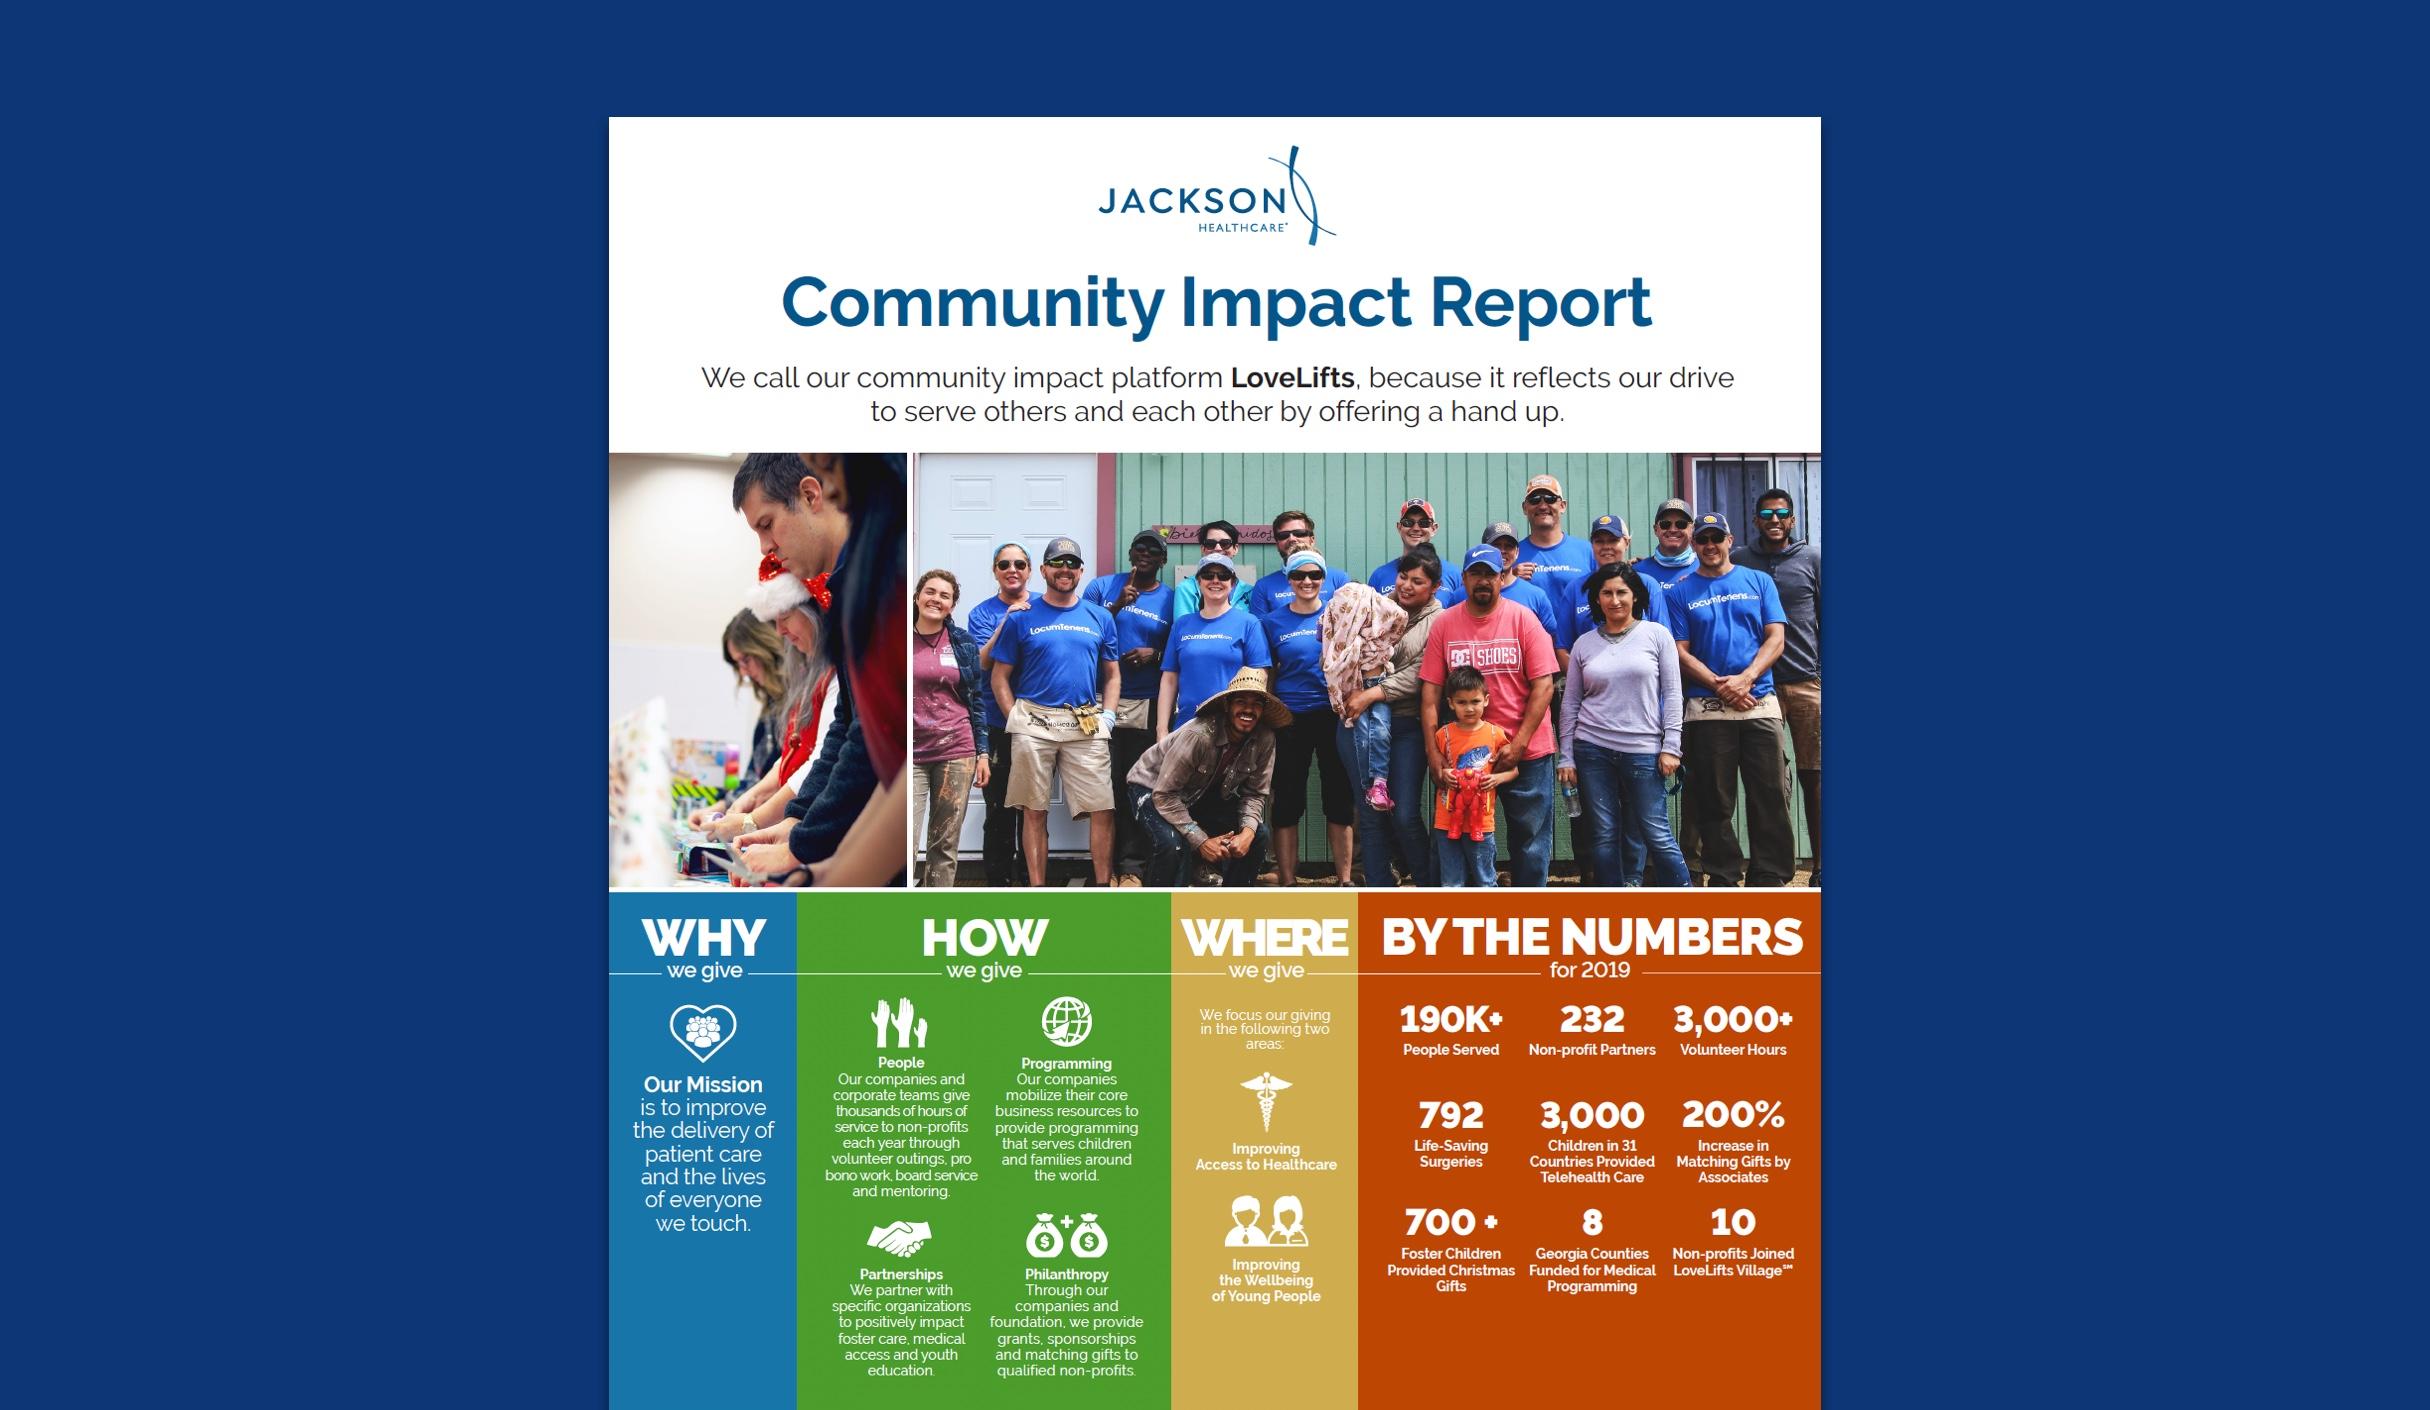 Jackson Healthcare community impact report